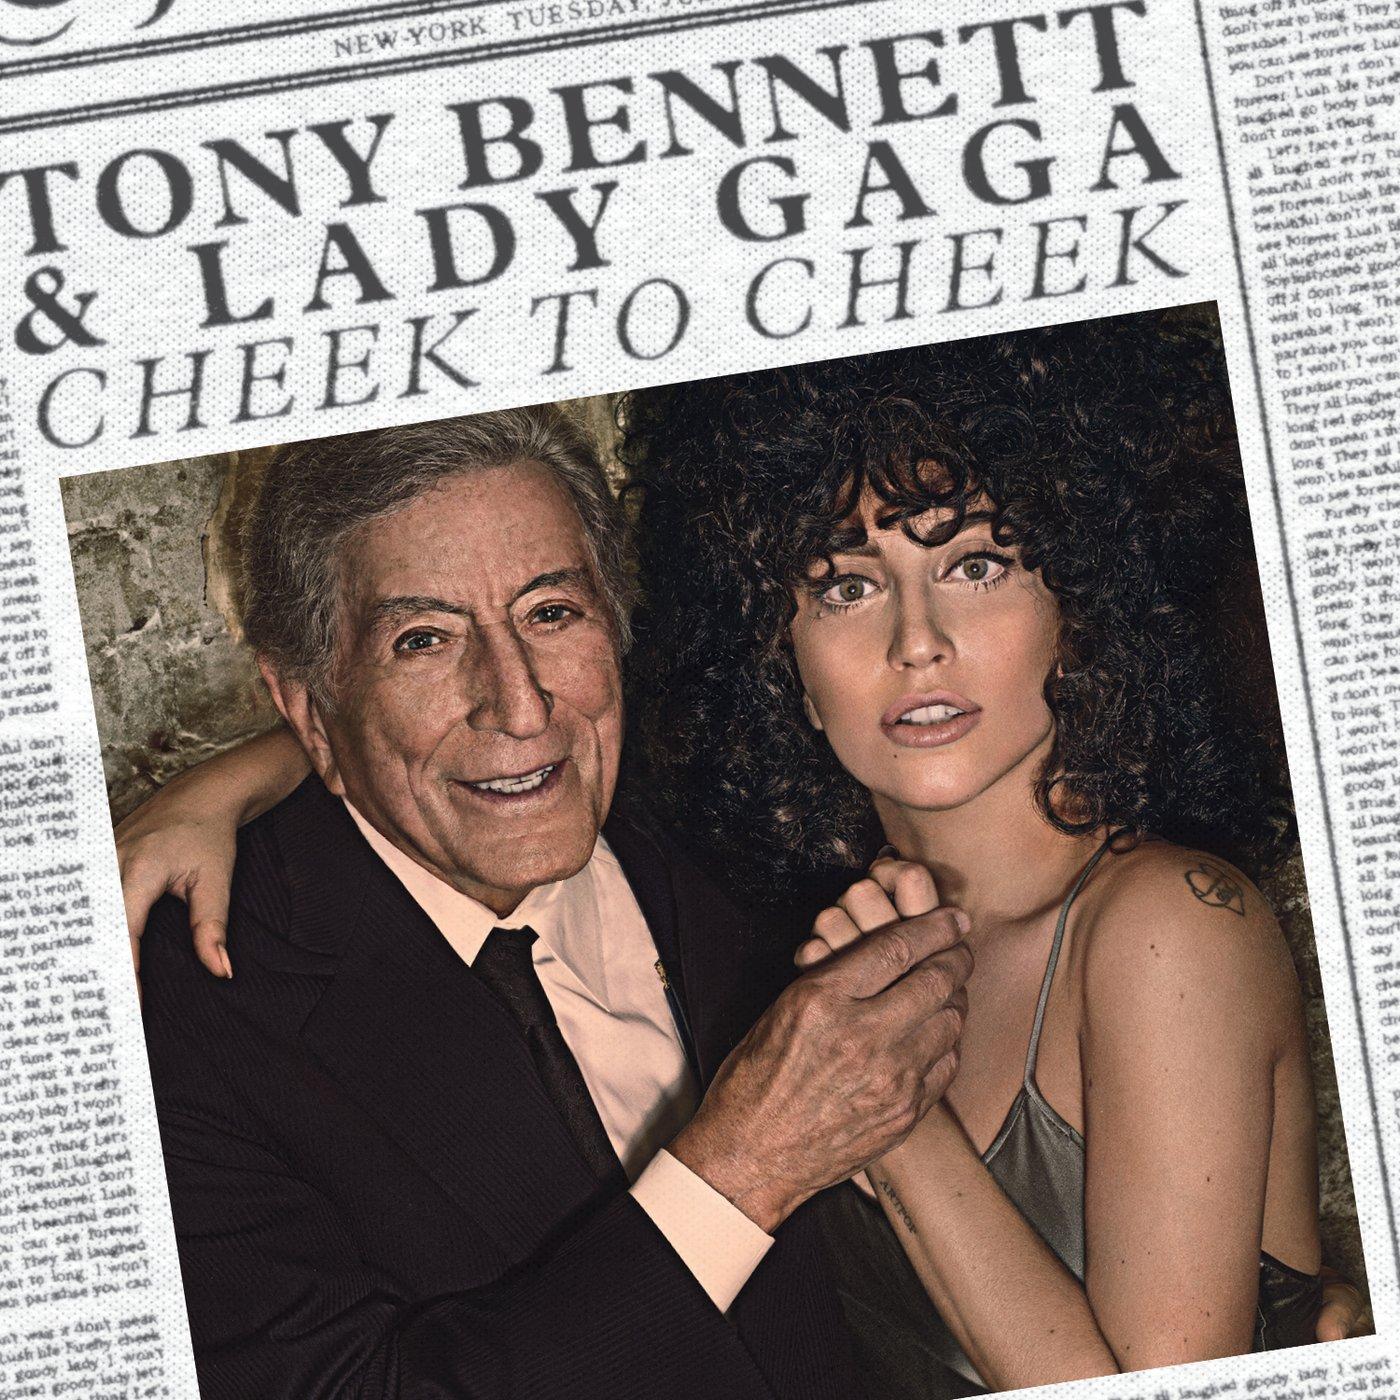 Tony Bennett & Lady Gaga: Cheek To Cheek Live [DVD]